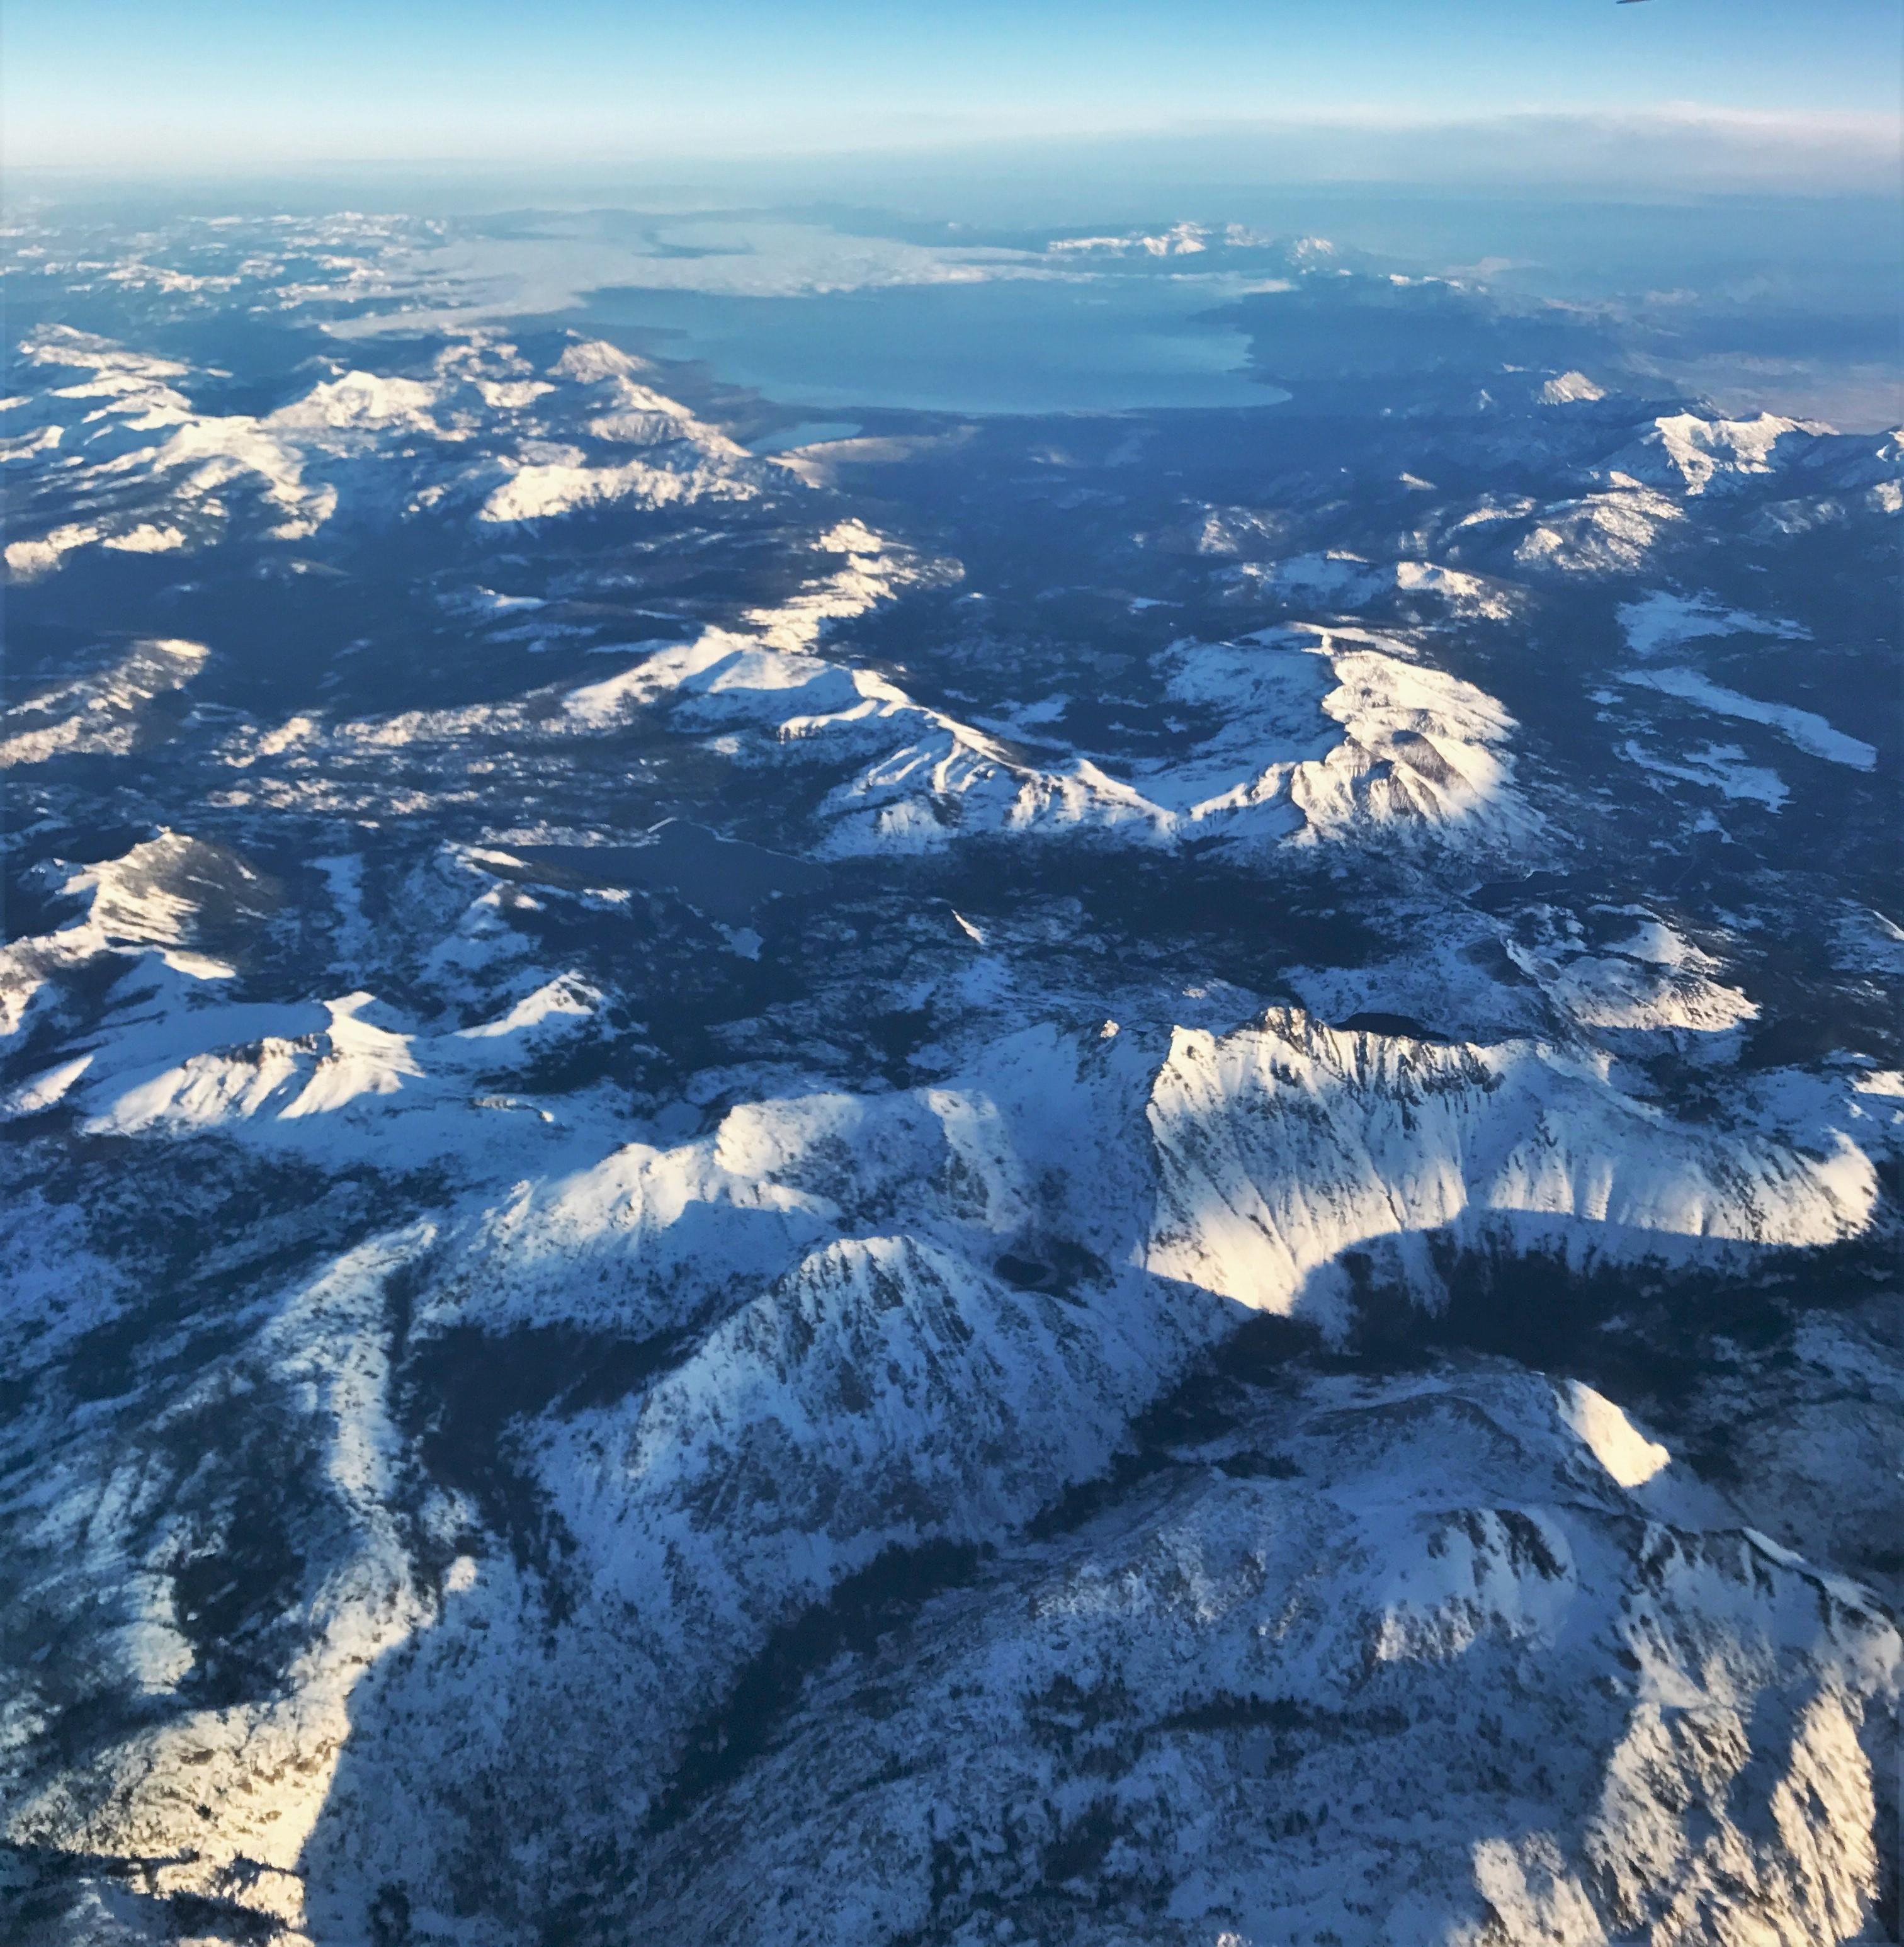 Pin By Erna Jaksic On Nature Lake Tahoe Sky Amazing Nature